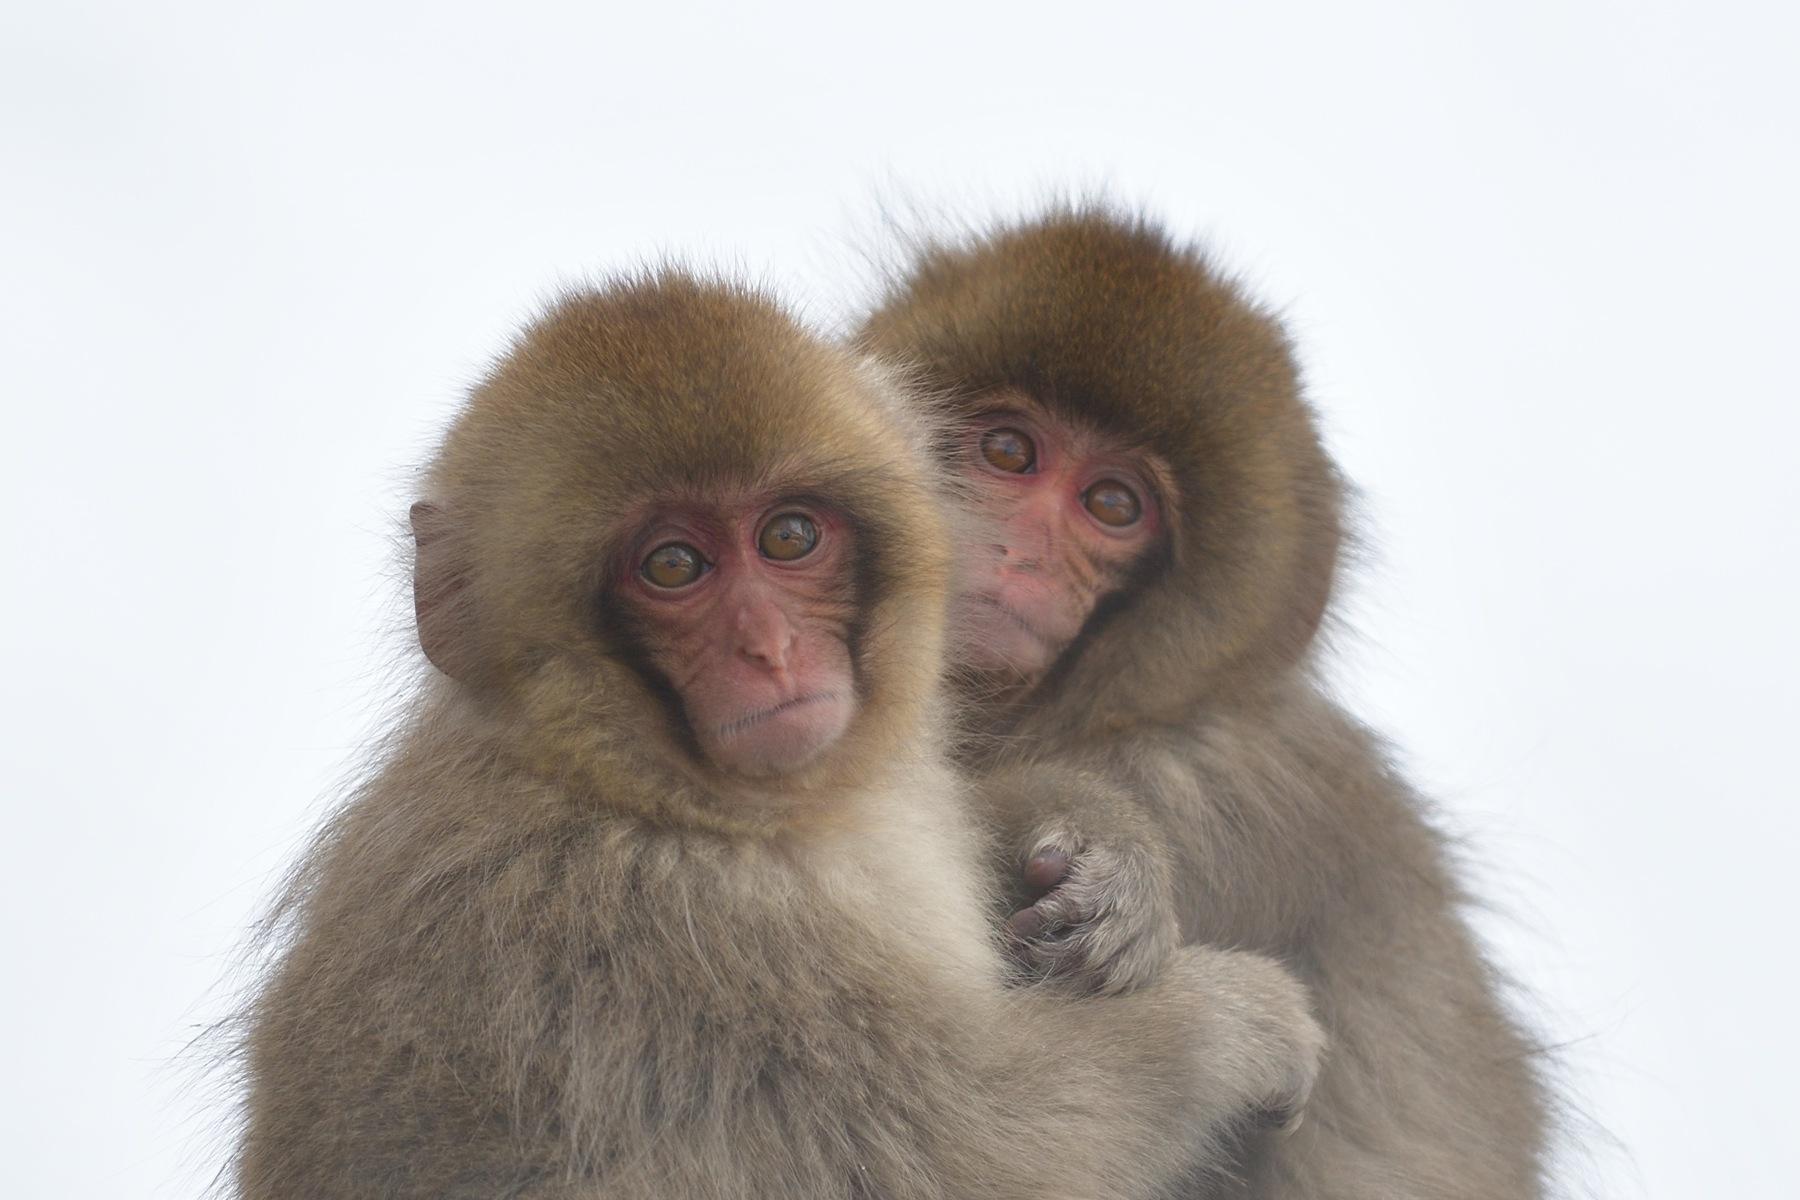 Snow Monkey Babies by Mubi.A